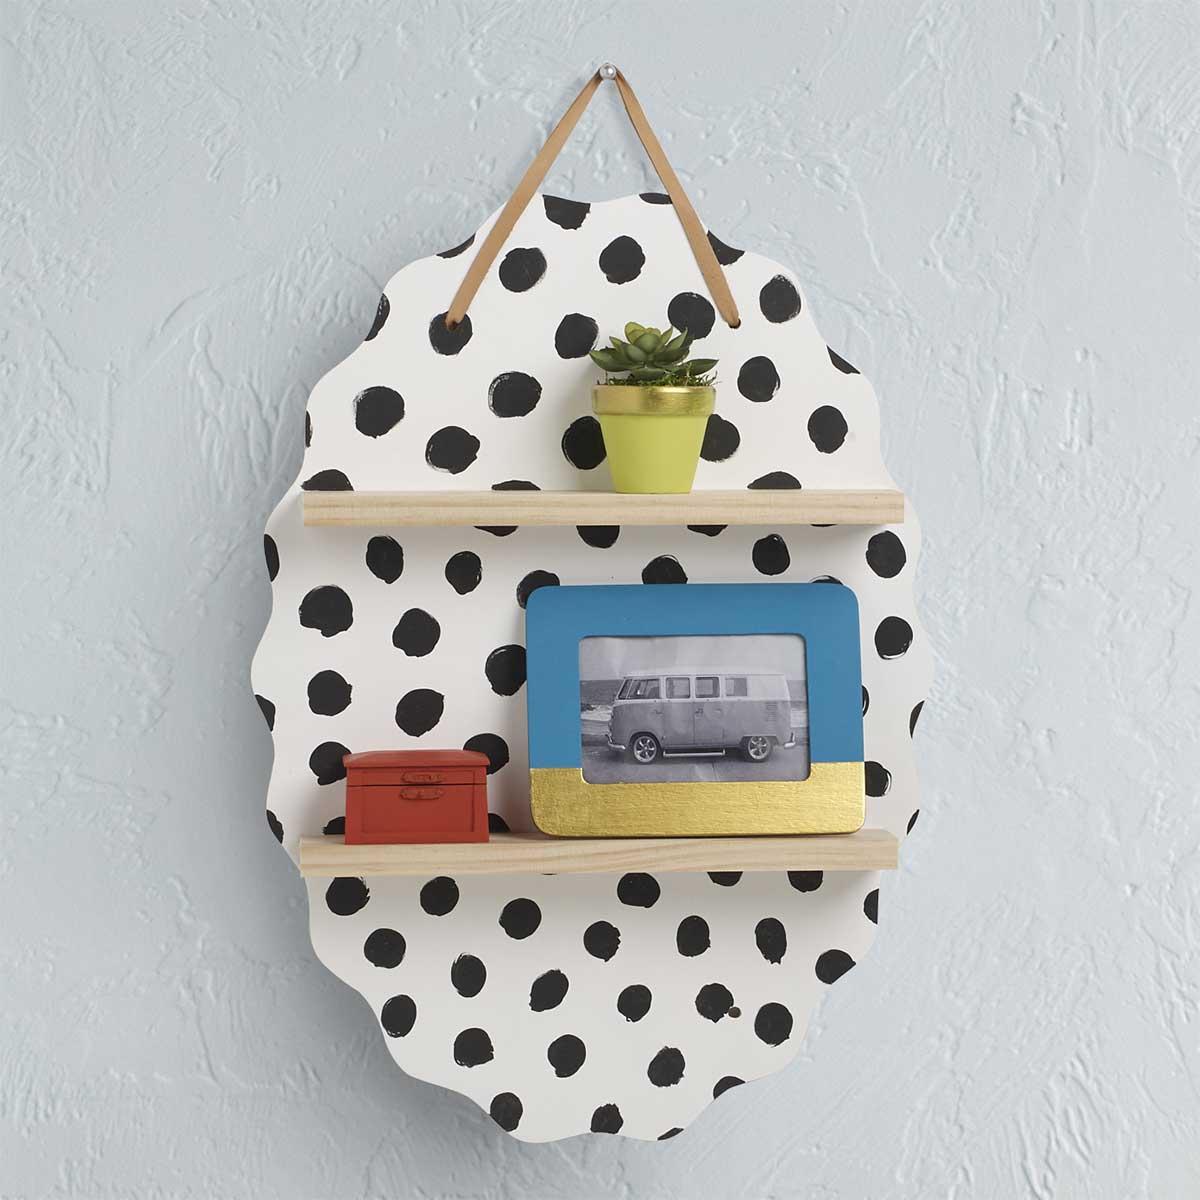 Polka-Dot Shelf Plaque